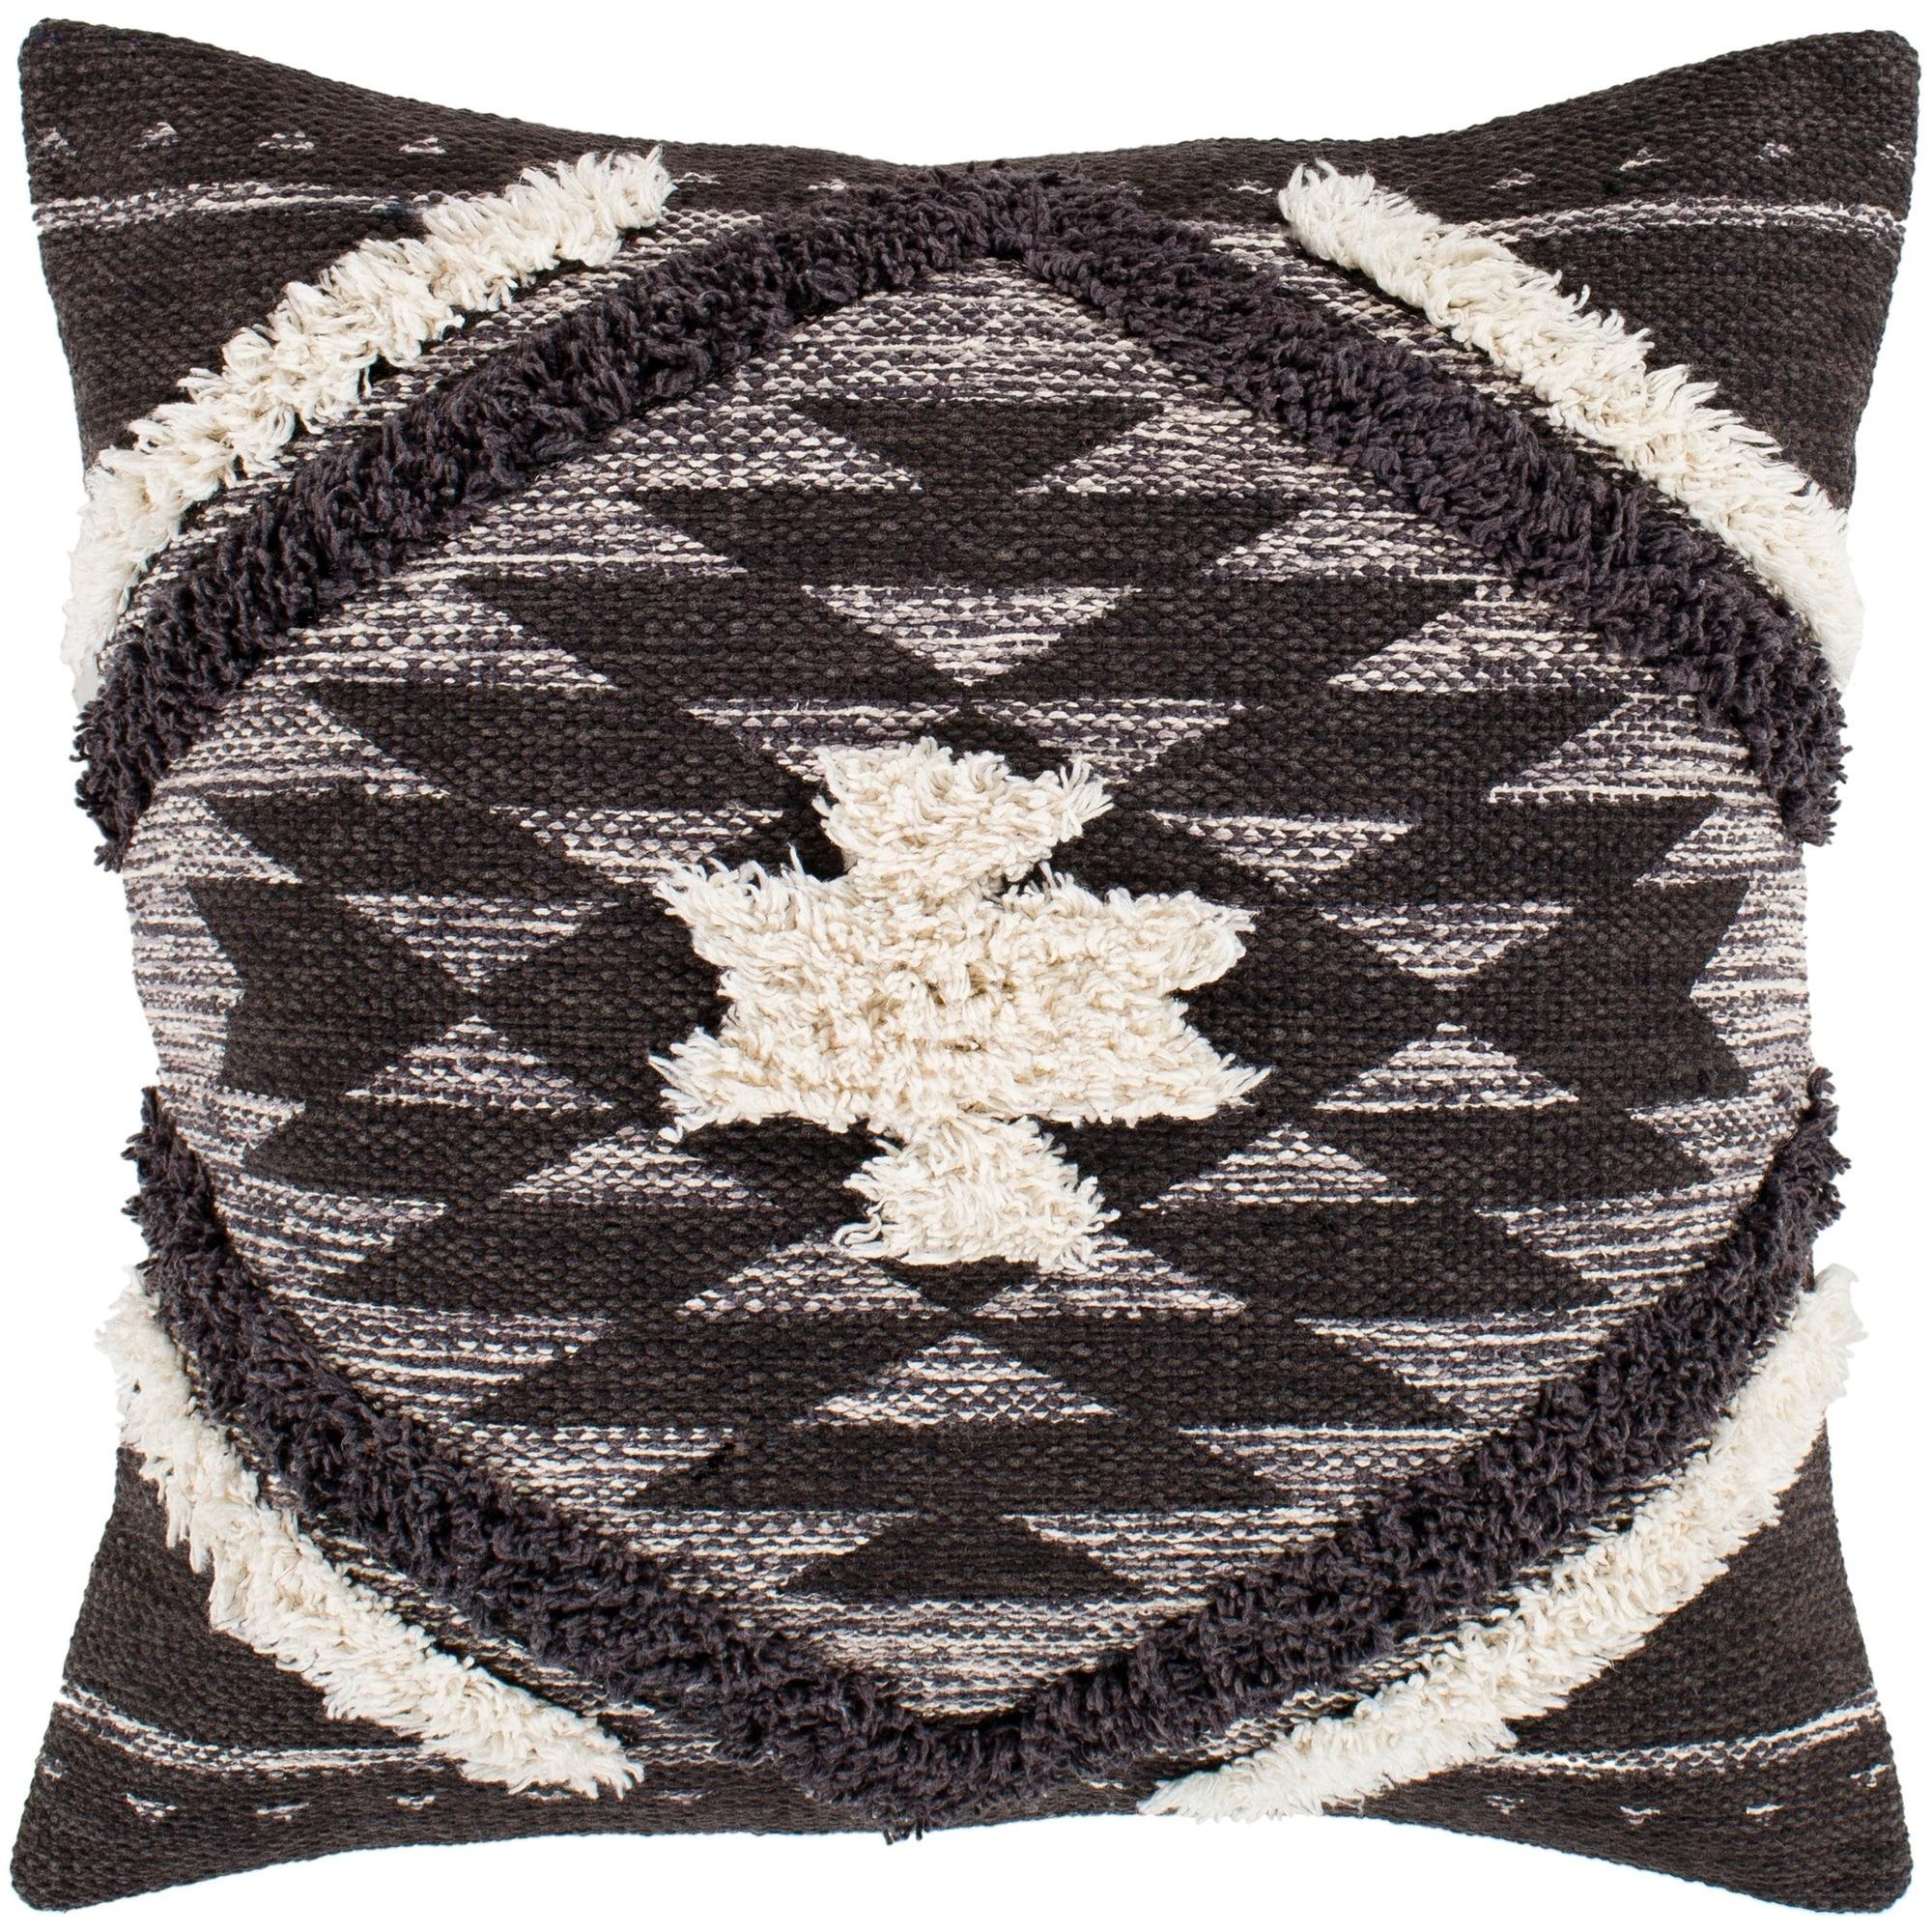 Shop Katherine Black Cream Boho Shag Throw Pillow Cover 20 X 20